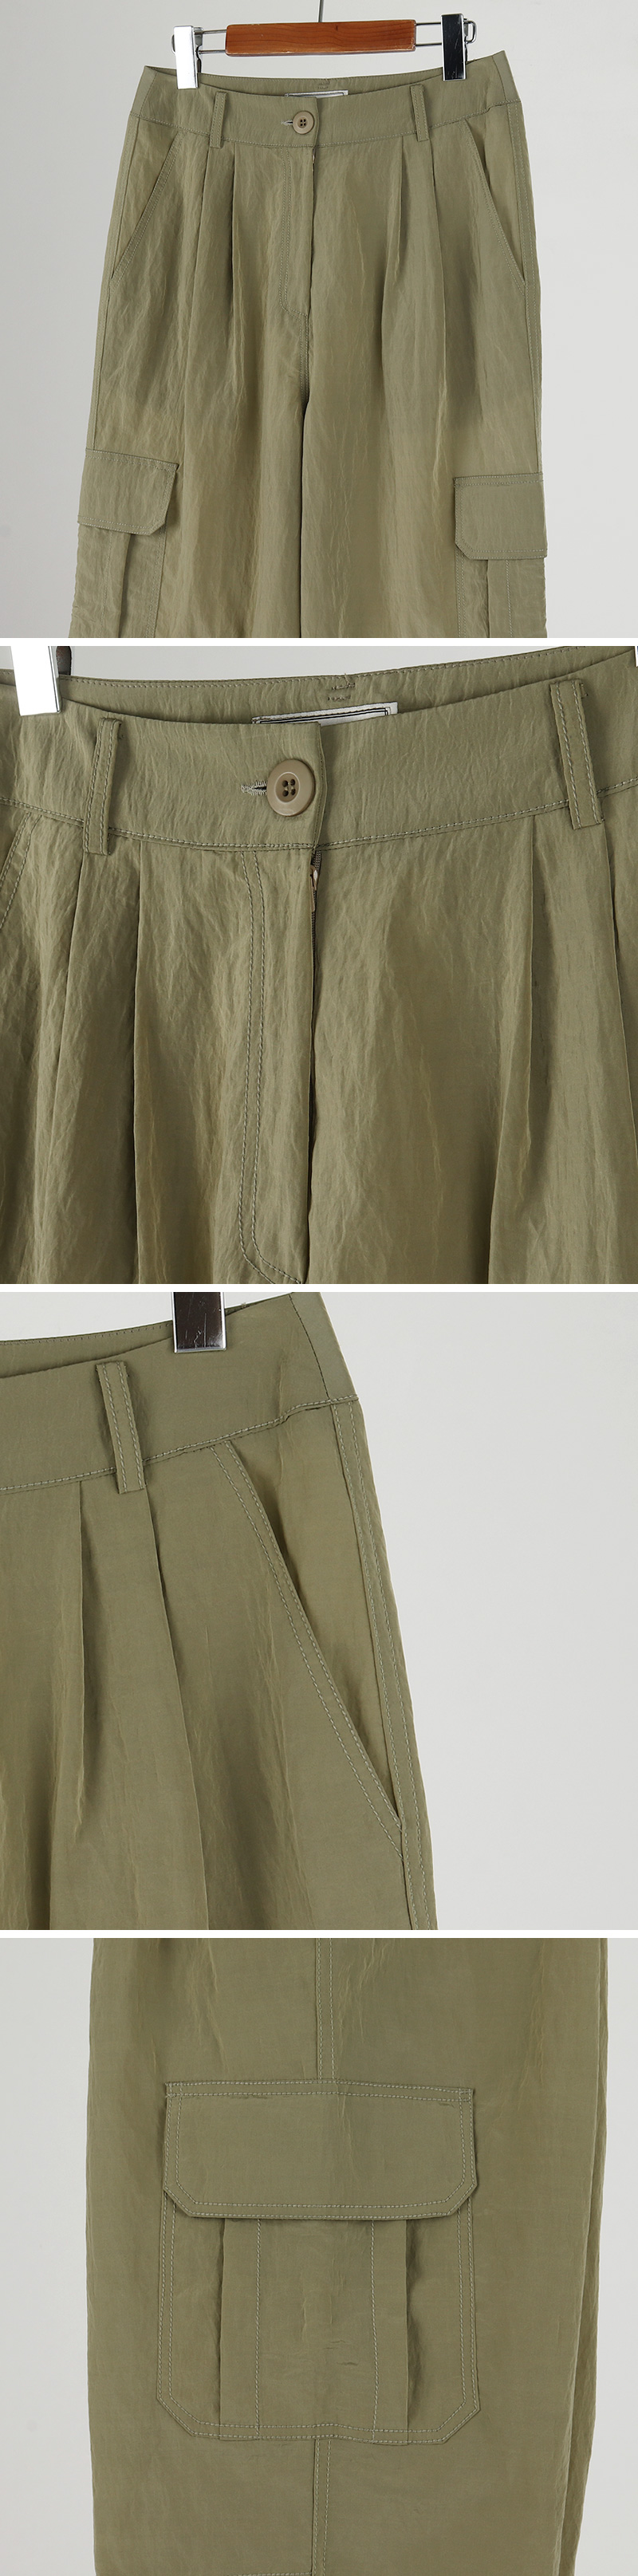 Running Cargo Pin Tuck Pants